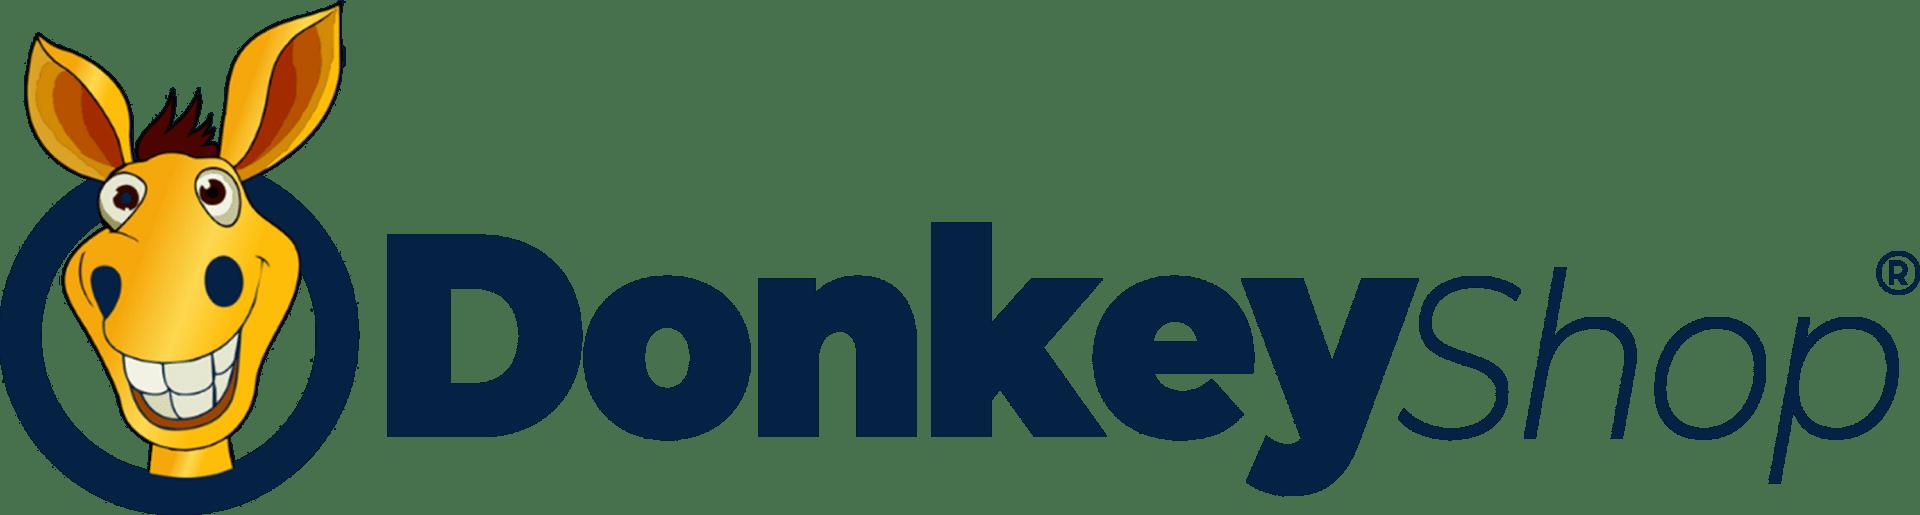 Donkeyshop